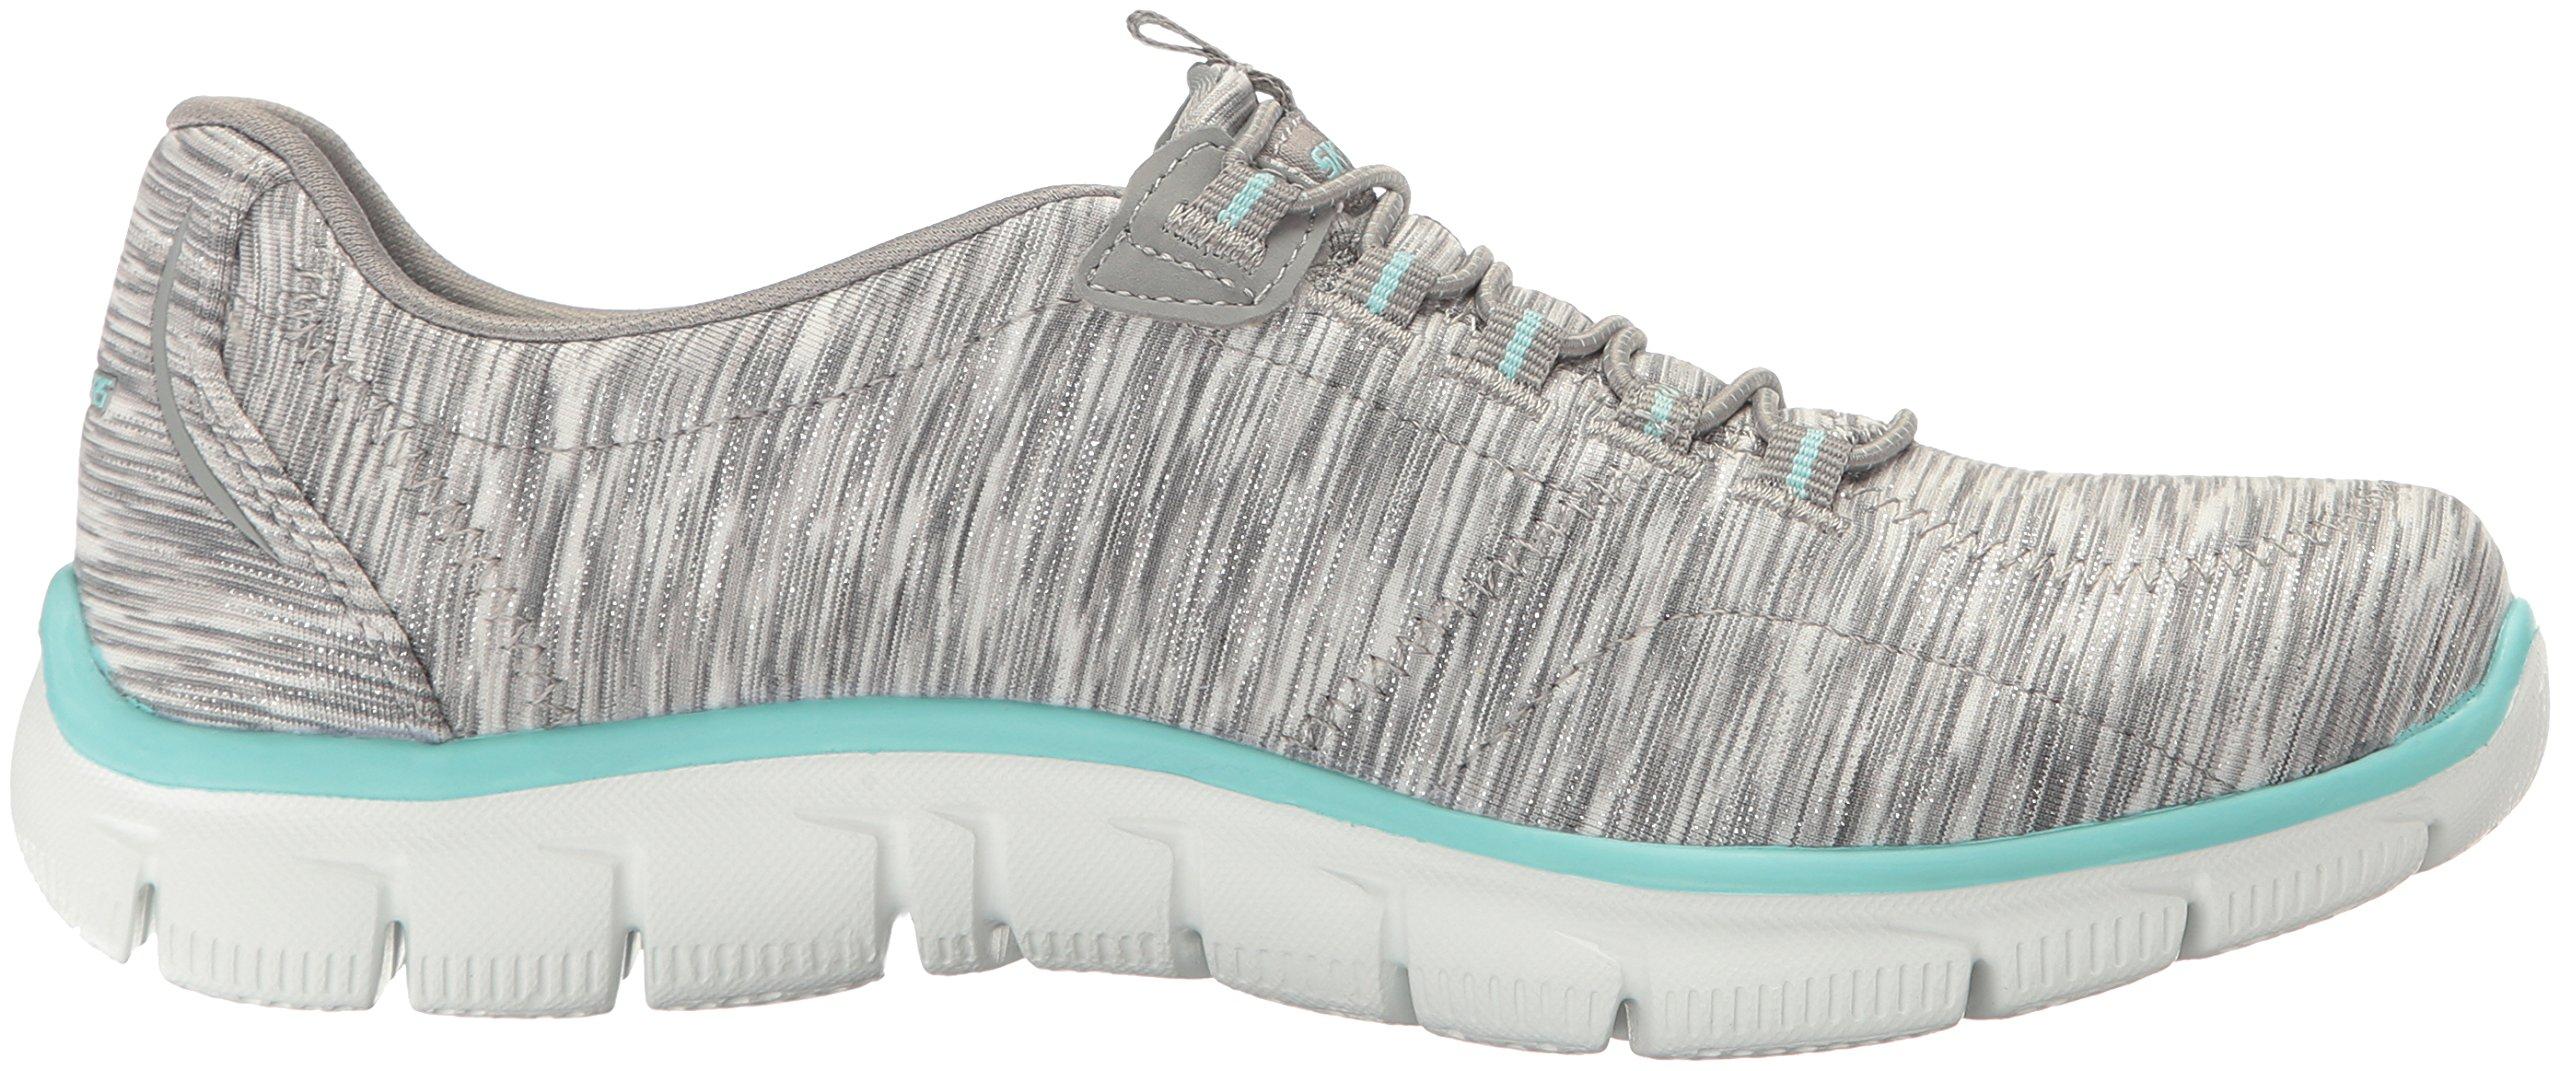 Skechers Women's Sport Empire - Rock Around Relaxed Fit Fashion Sneaker, Gray/Light Blue, 9 B(M) US by Skechers (Image #7)